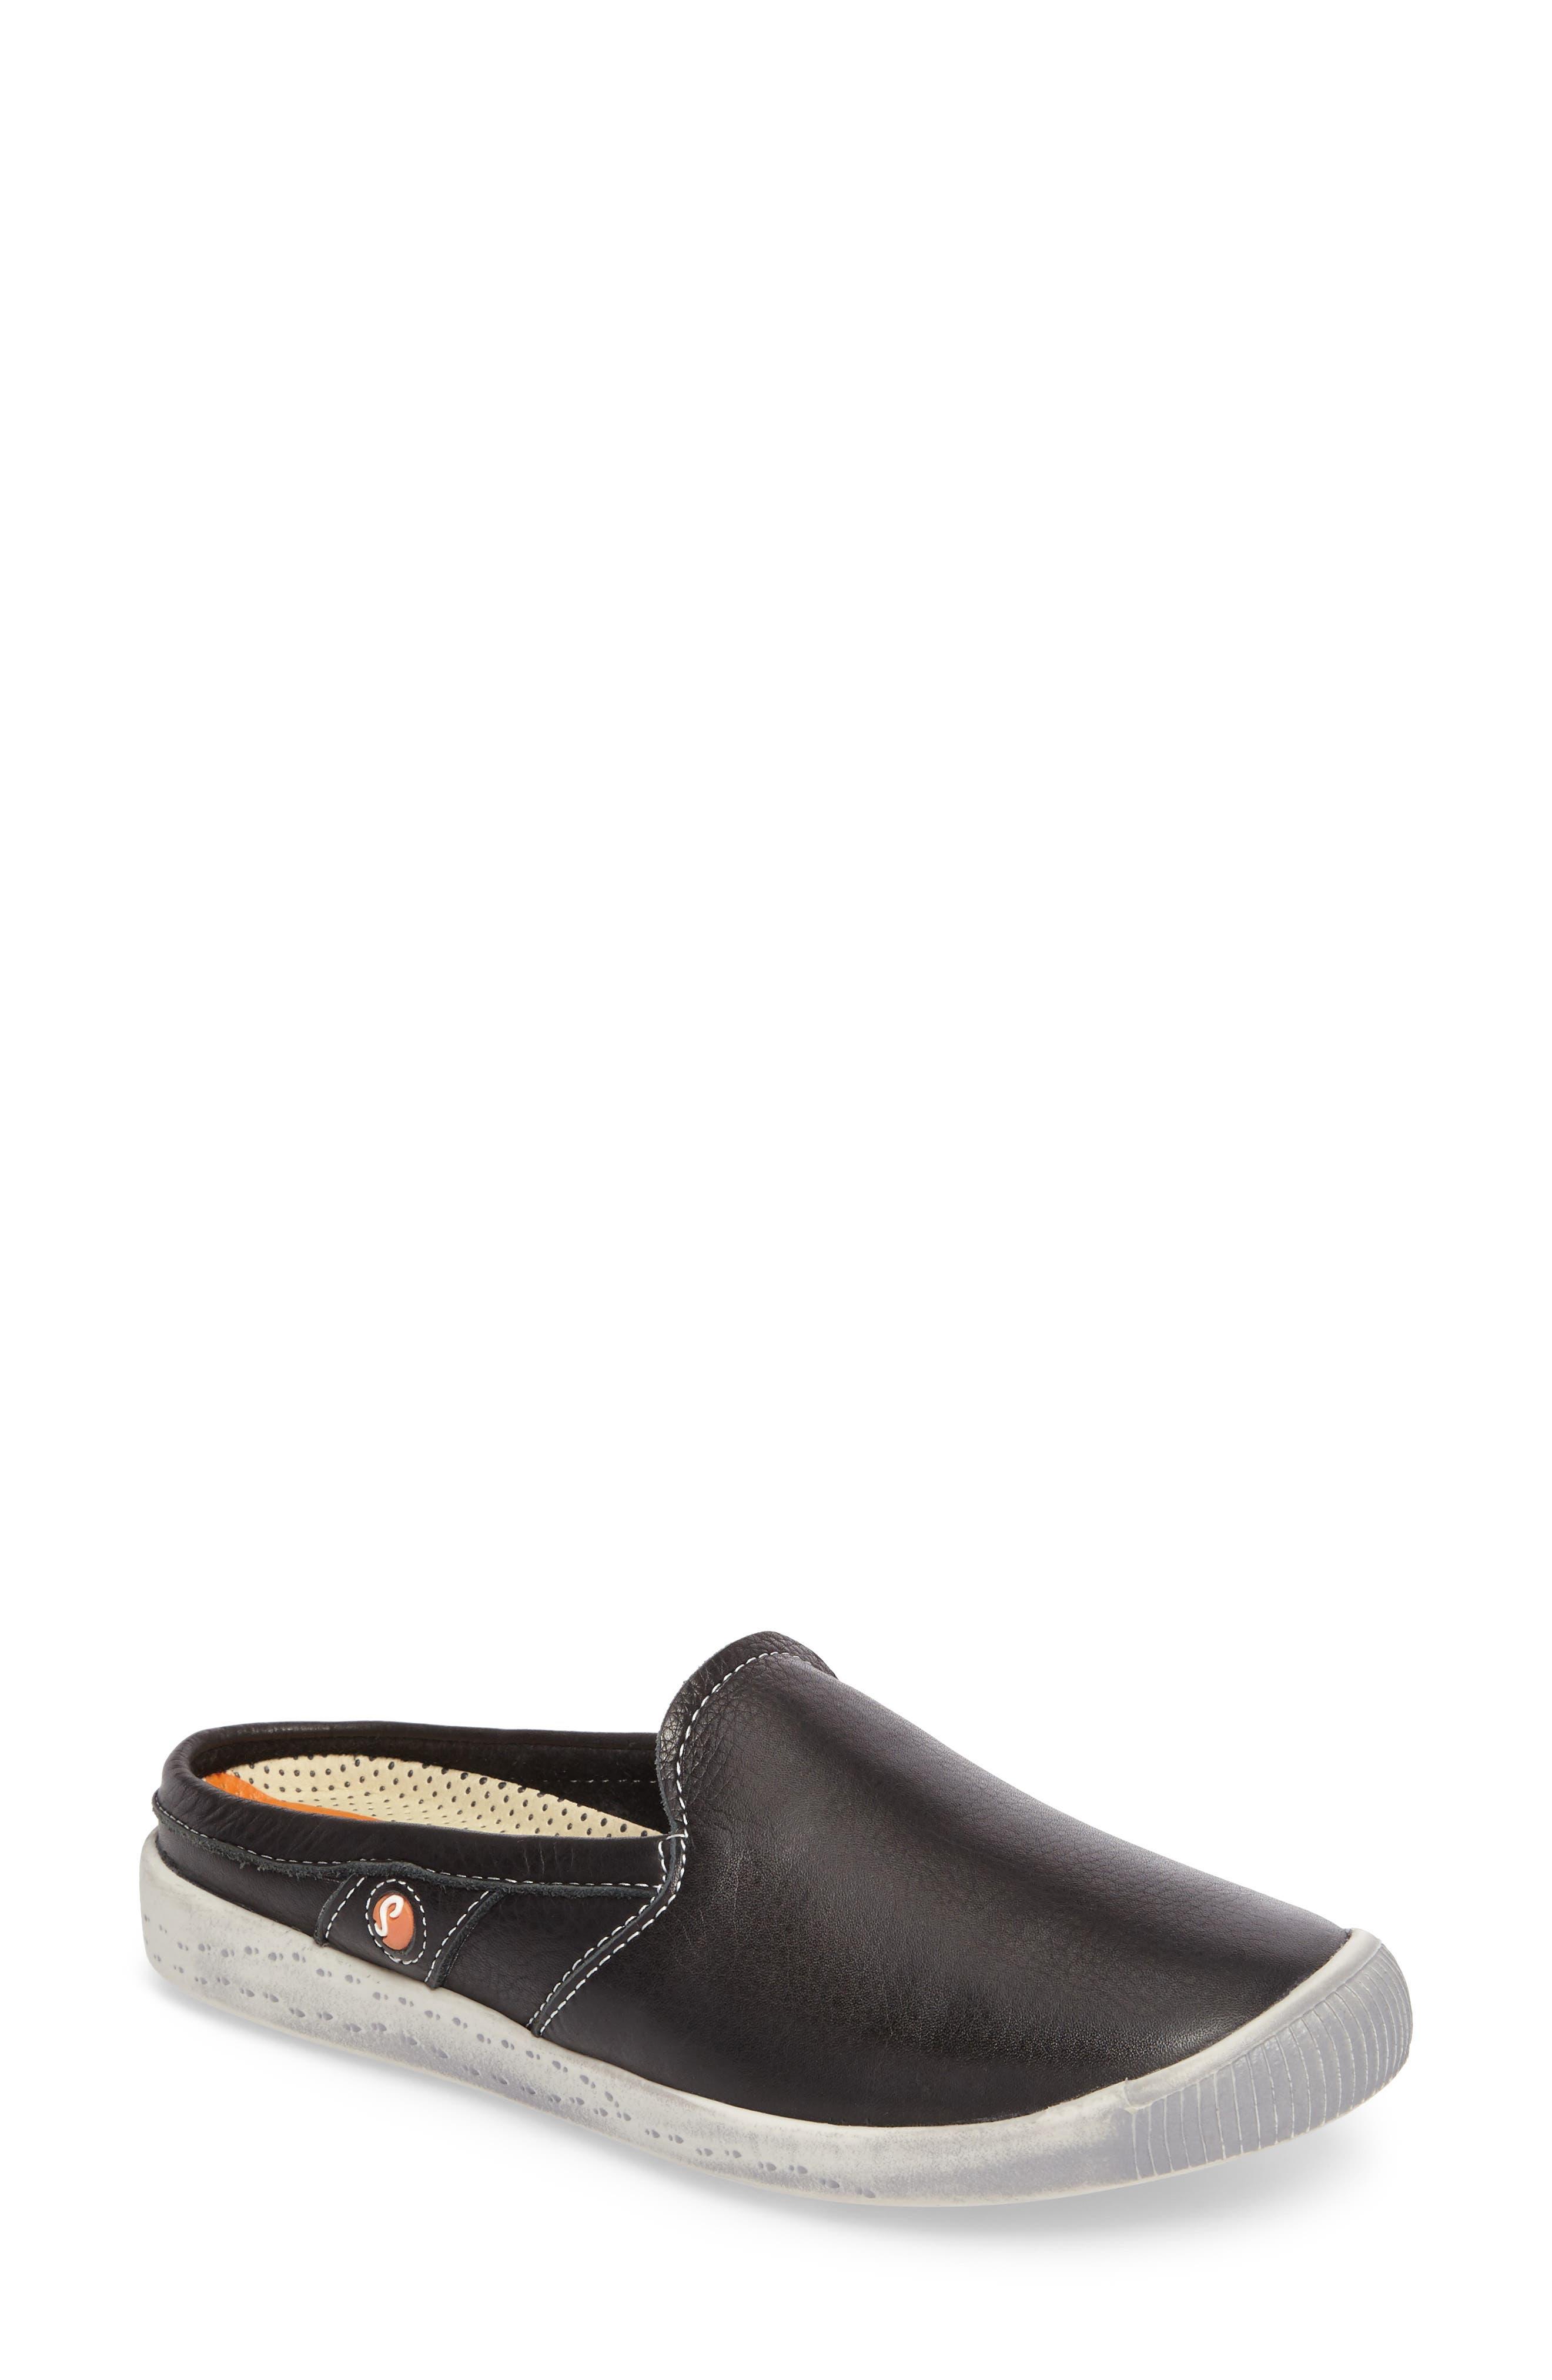 Imo Sneaker Mule,                         Main,                         color, 001